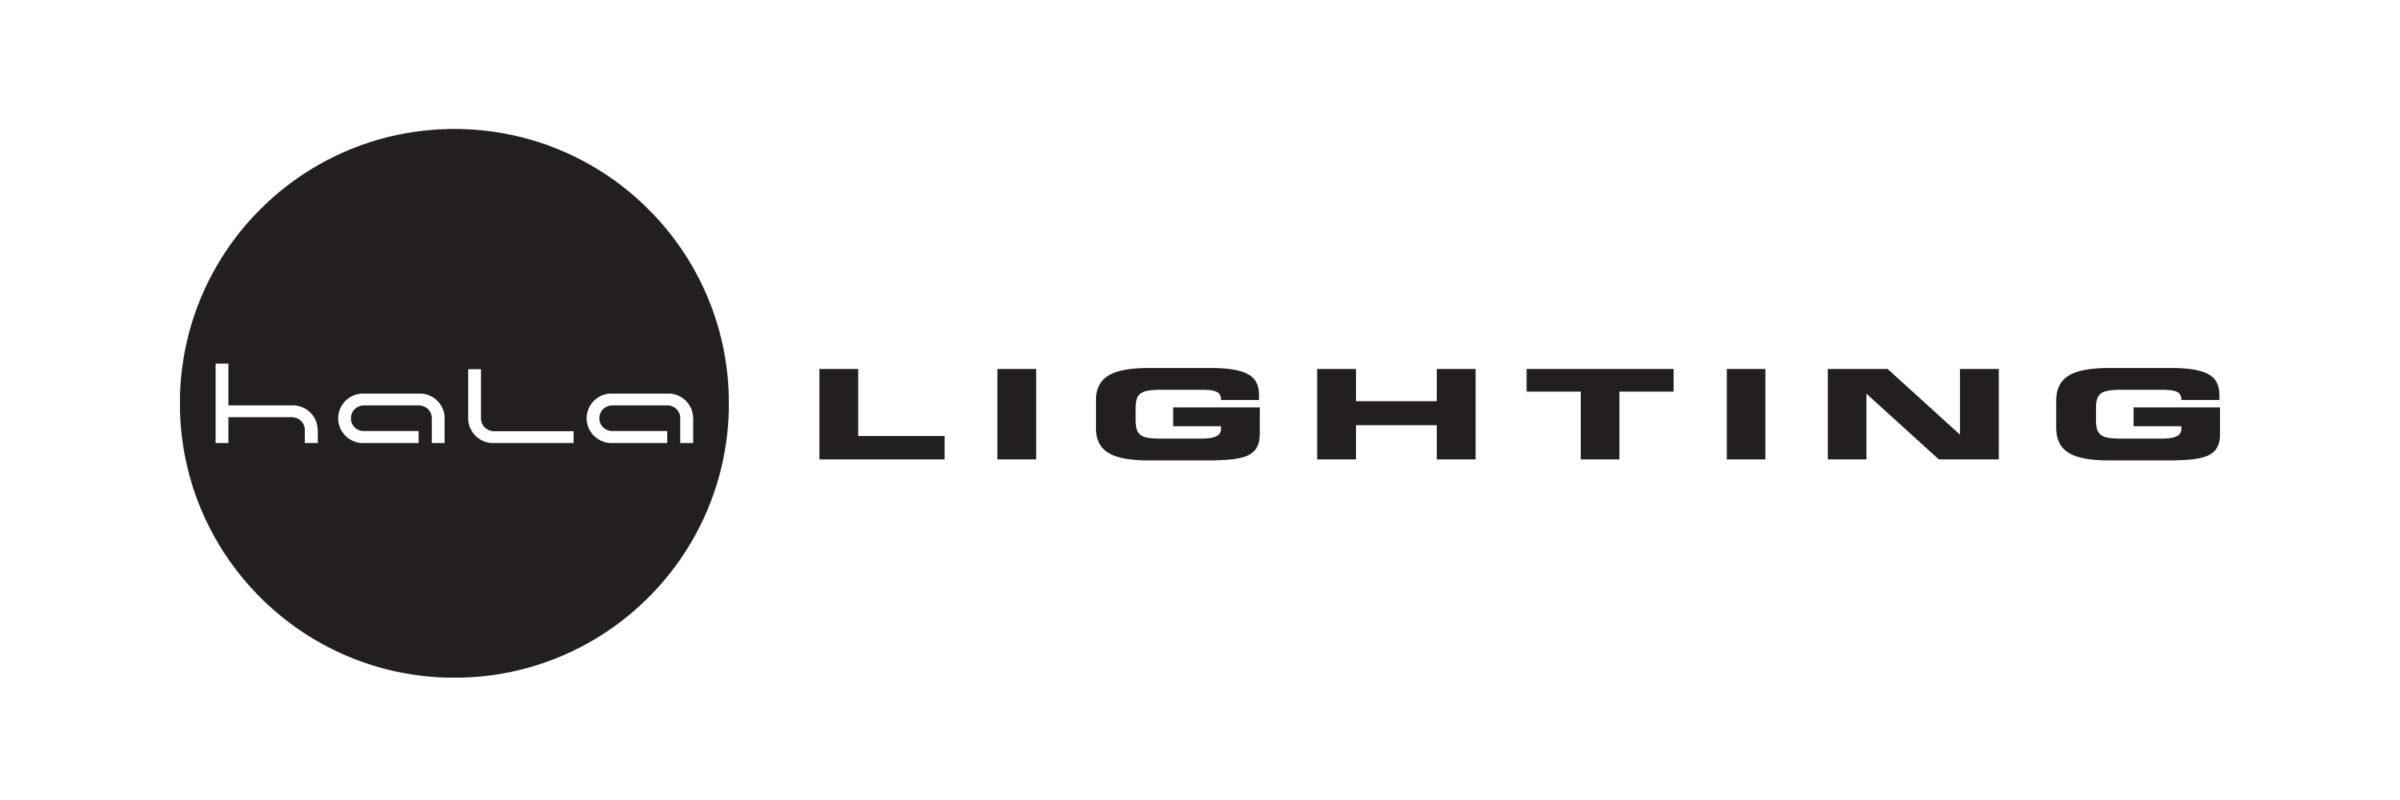 Hala-lighting